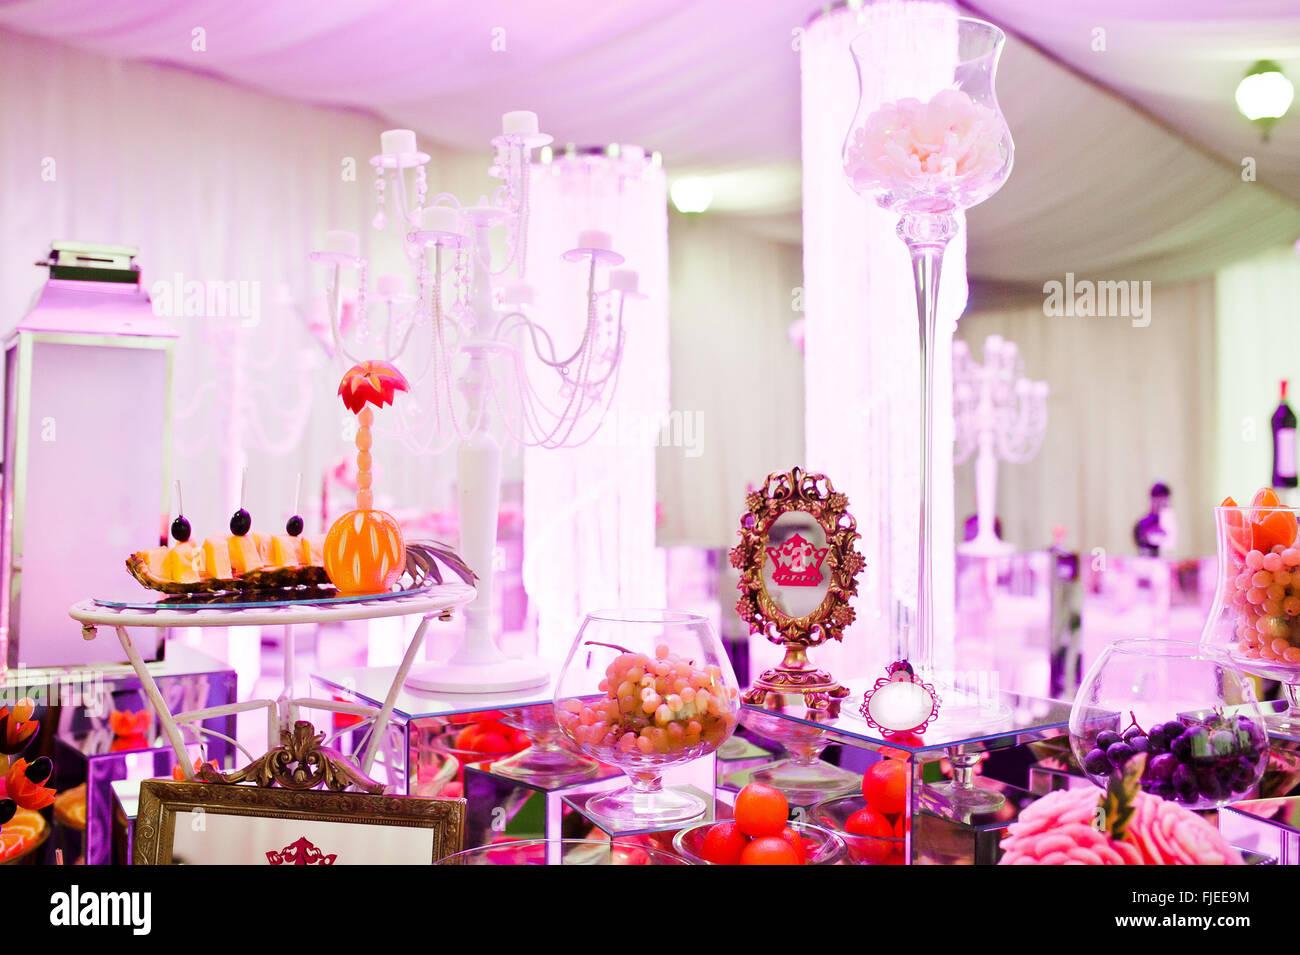 Table Set Luxurious Wedding Dinner Stock Photos & Table Set ...